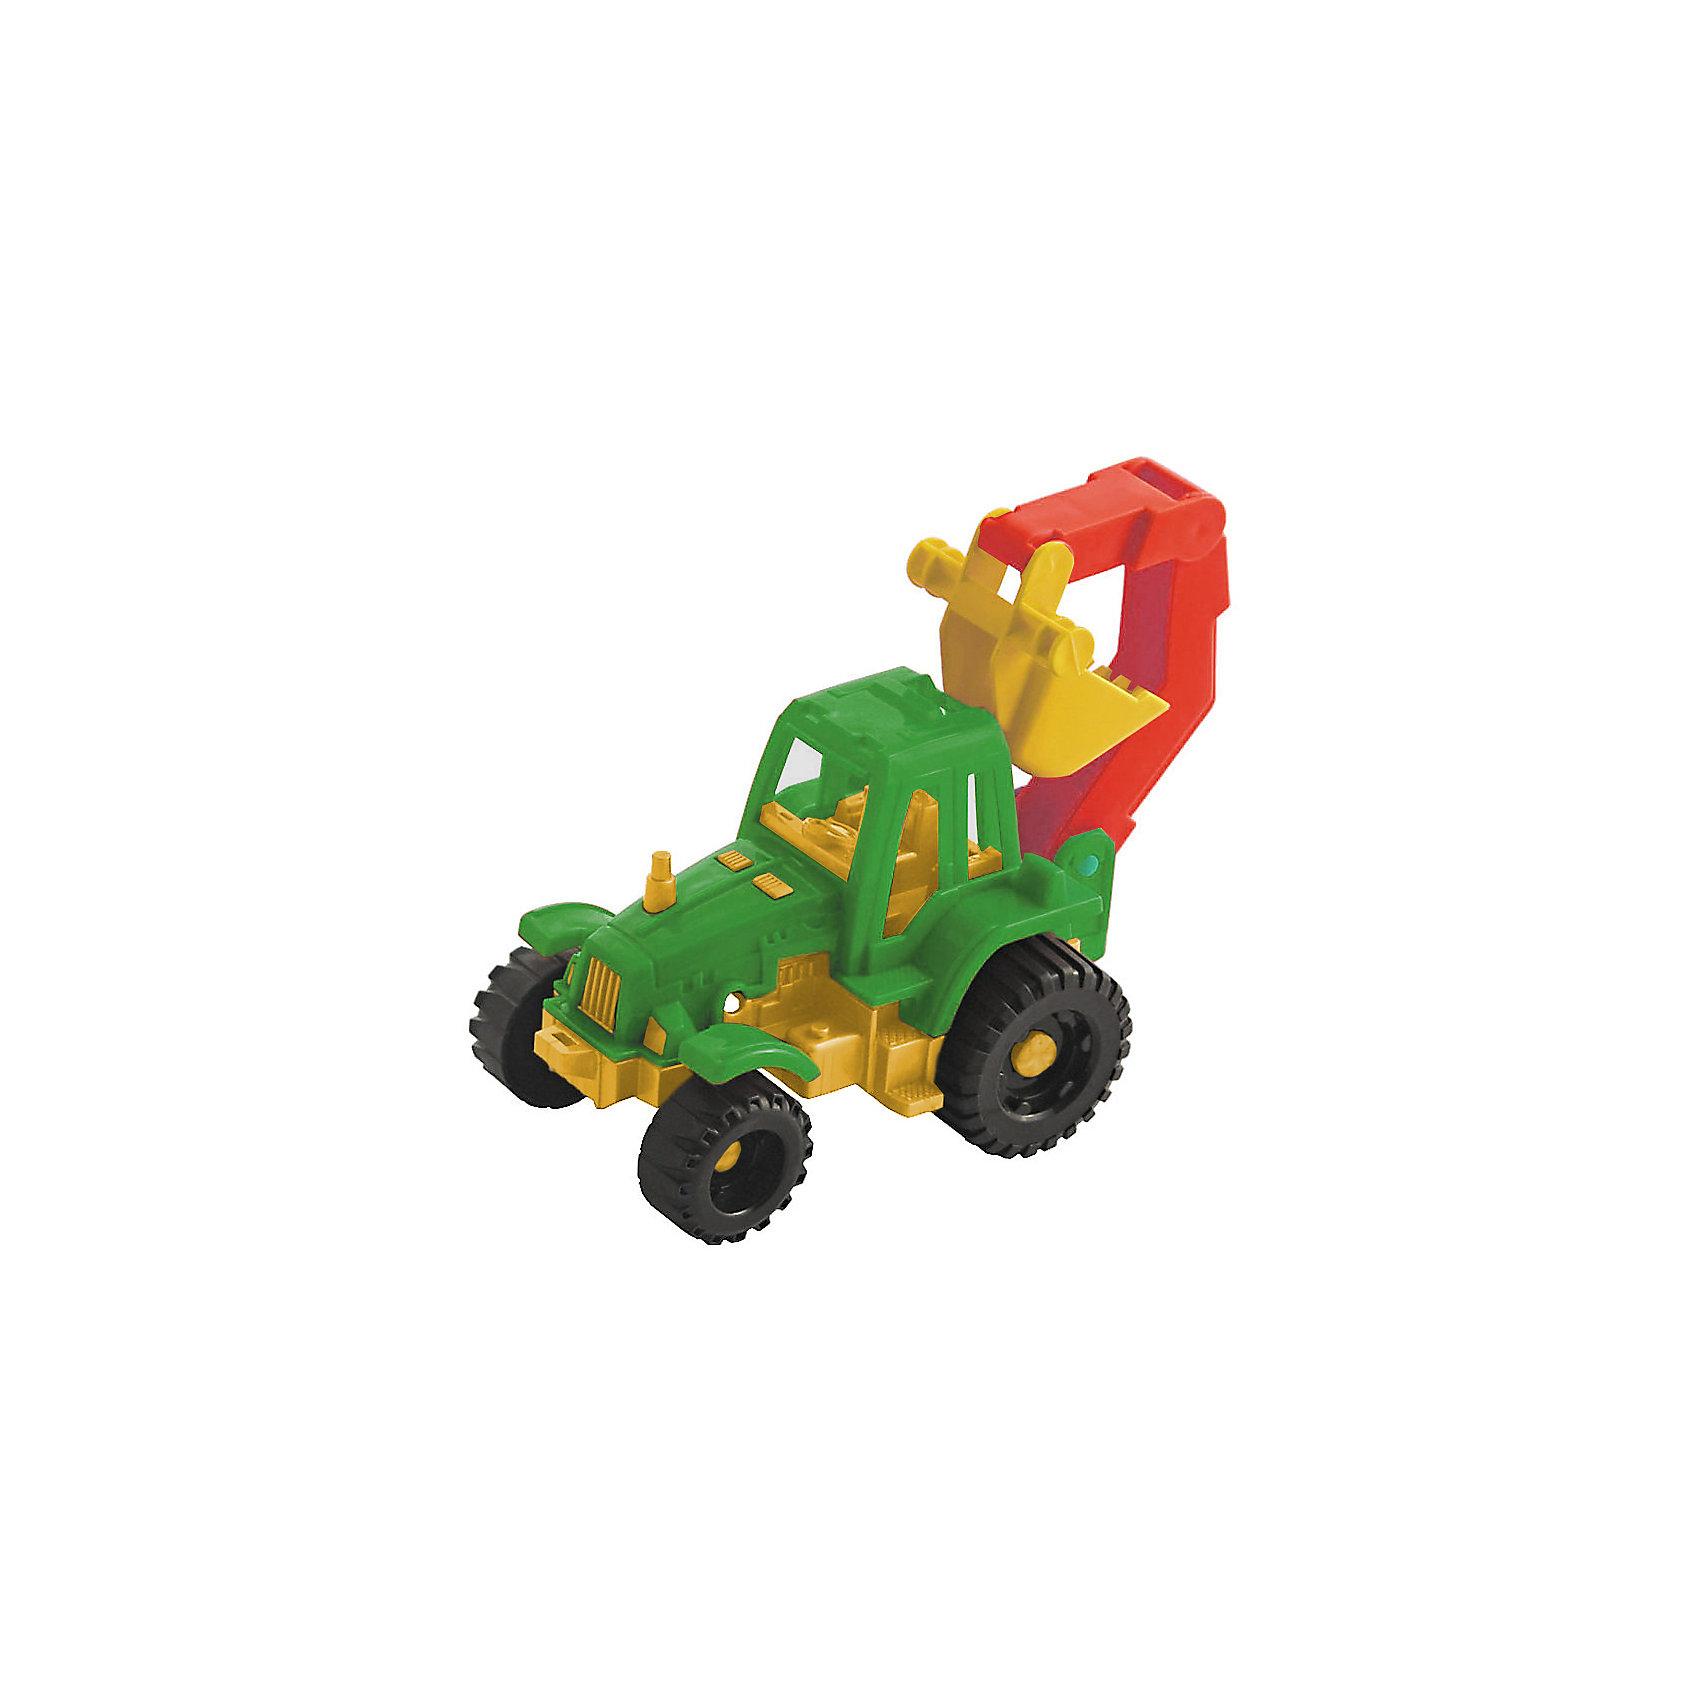 Нордпласт Трактор Ижора с ковшом, Нордпласт, в ассортименте грабли нордпласт со вставкой в ассортименте